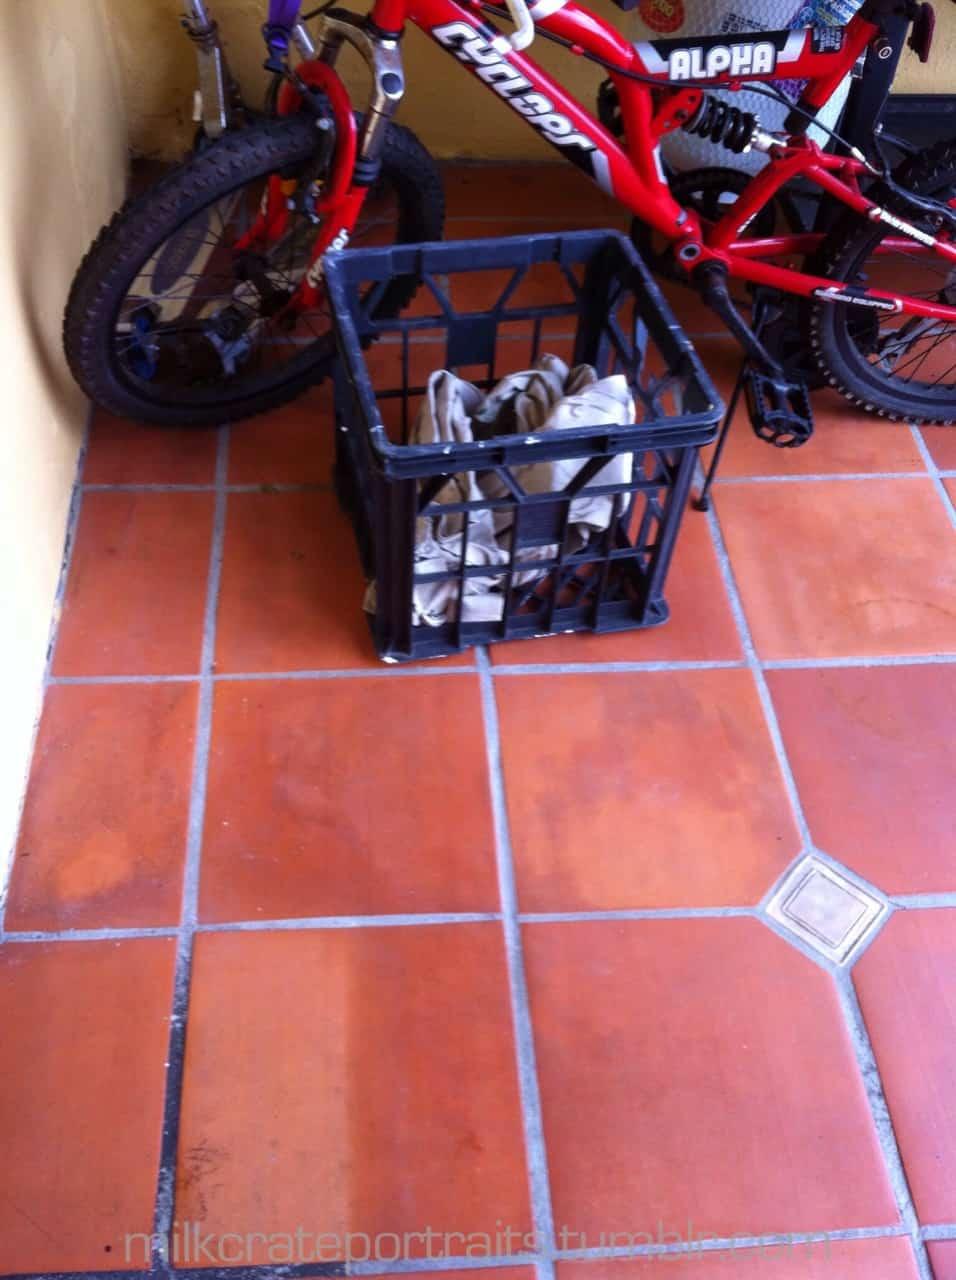 Bike & crate